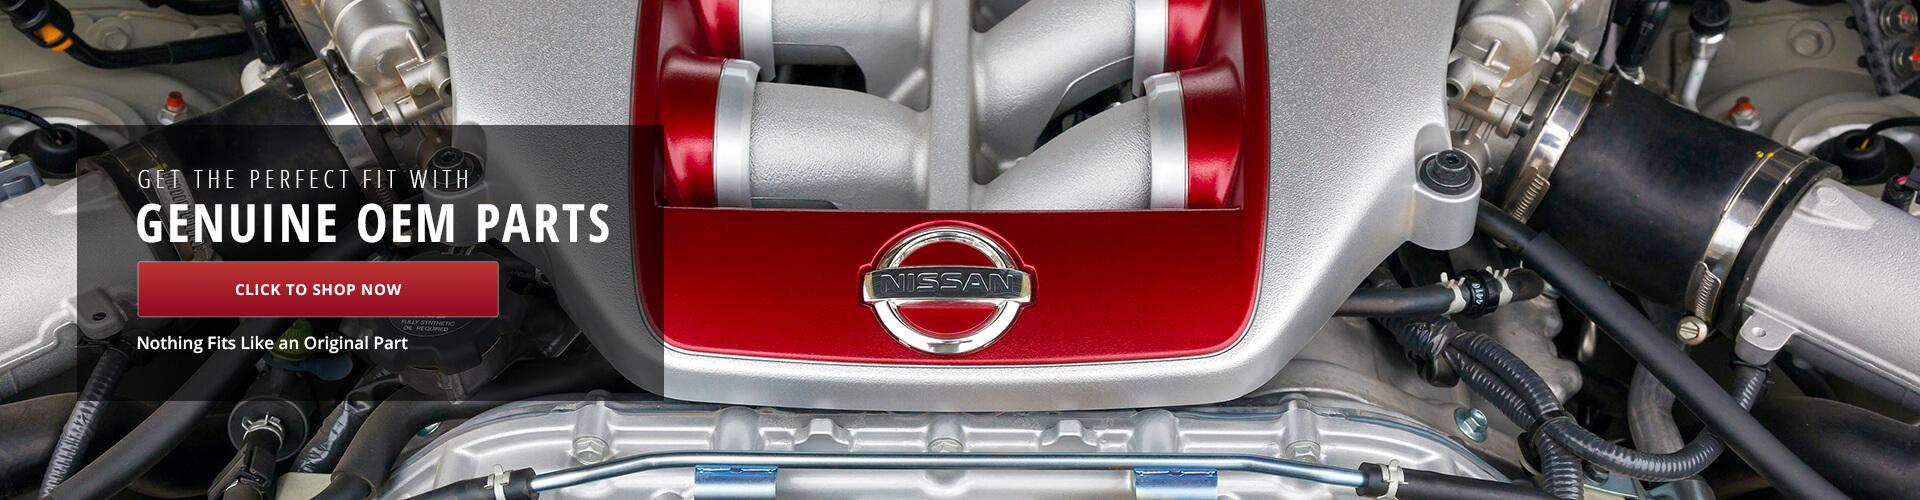 Tascaparts Com Factory Oem Auto Parts Accessories